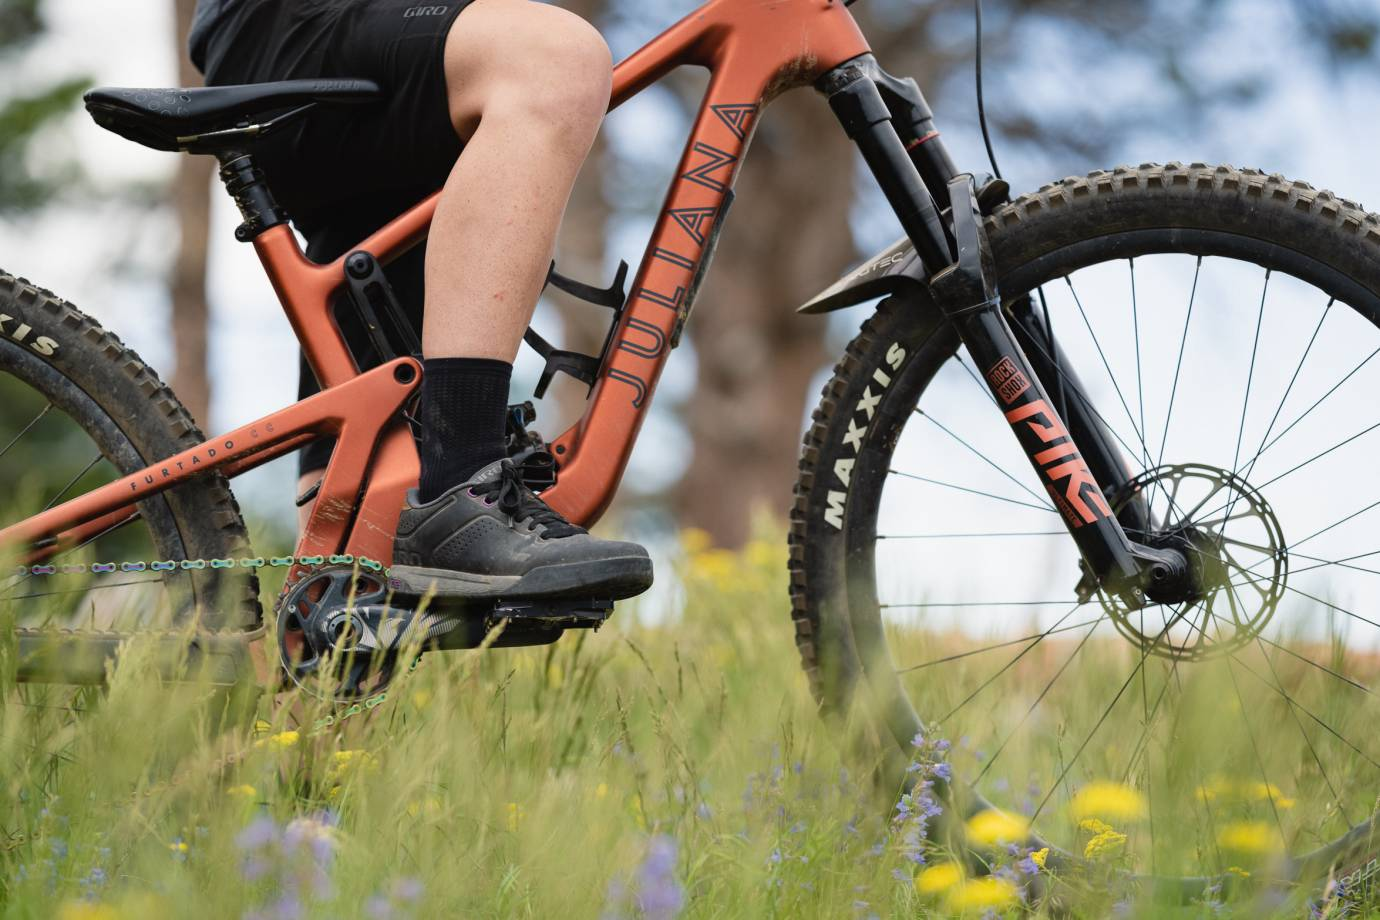 rider wearing the black Giro Latch MTB shoe and straddling an orange Juliana mountain bike